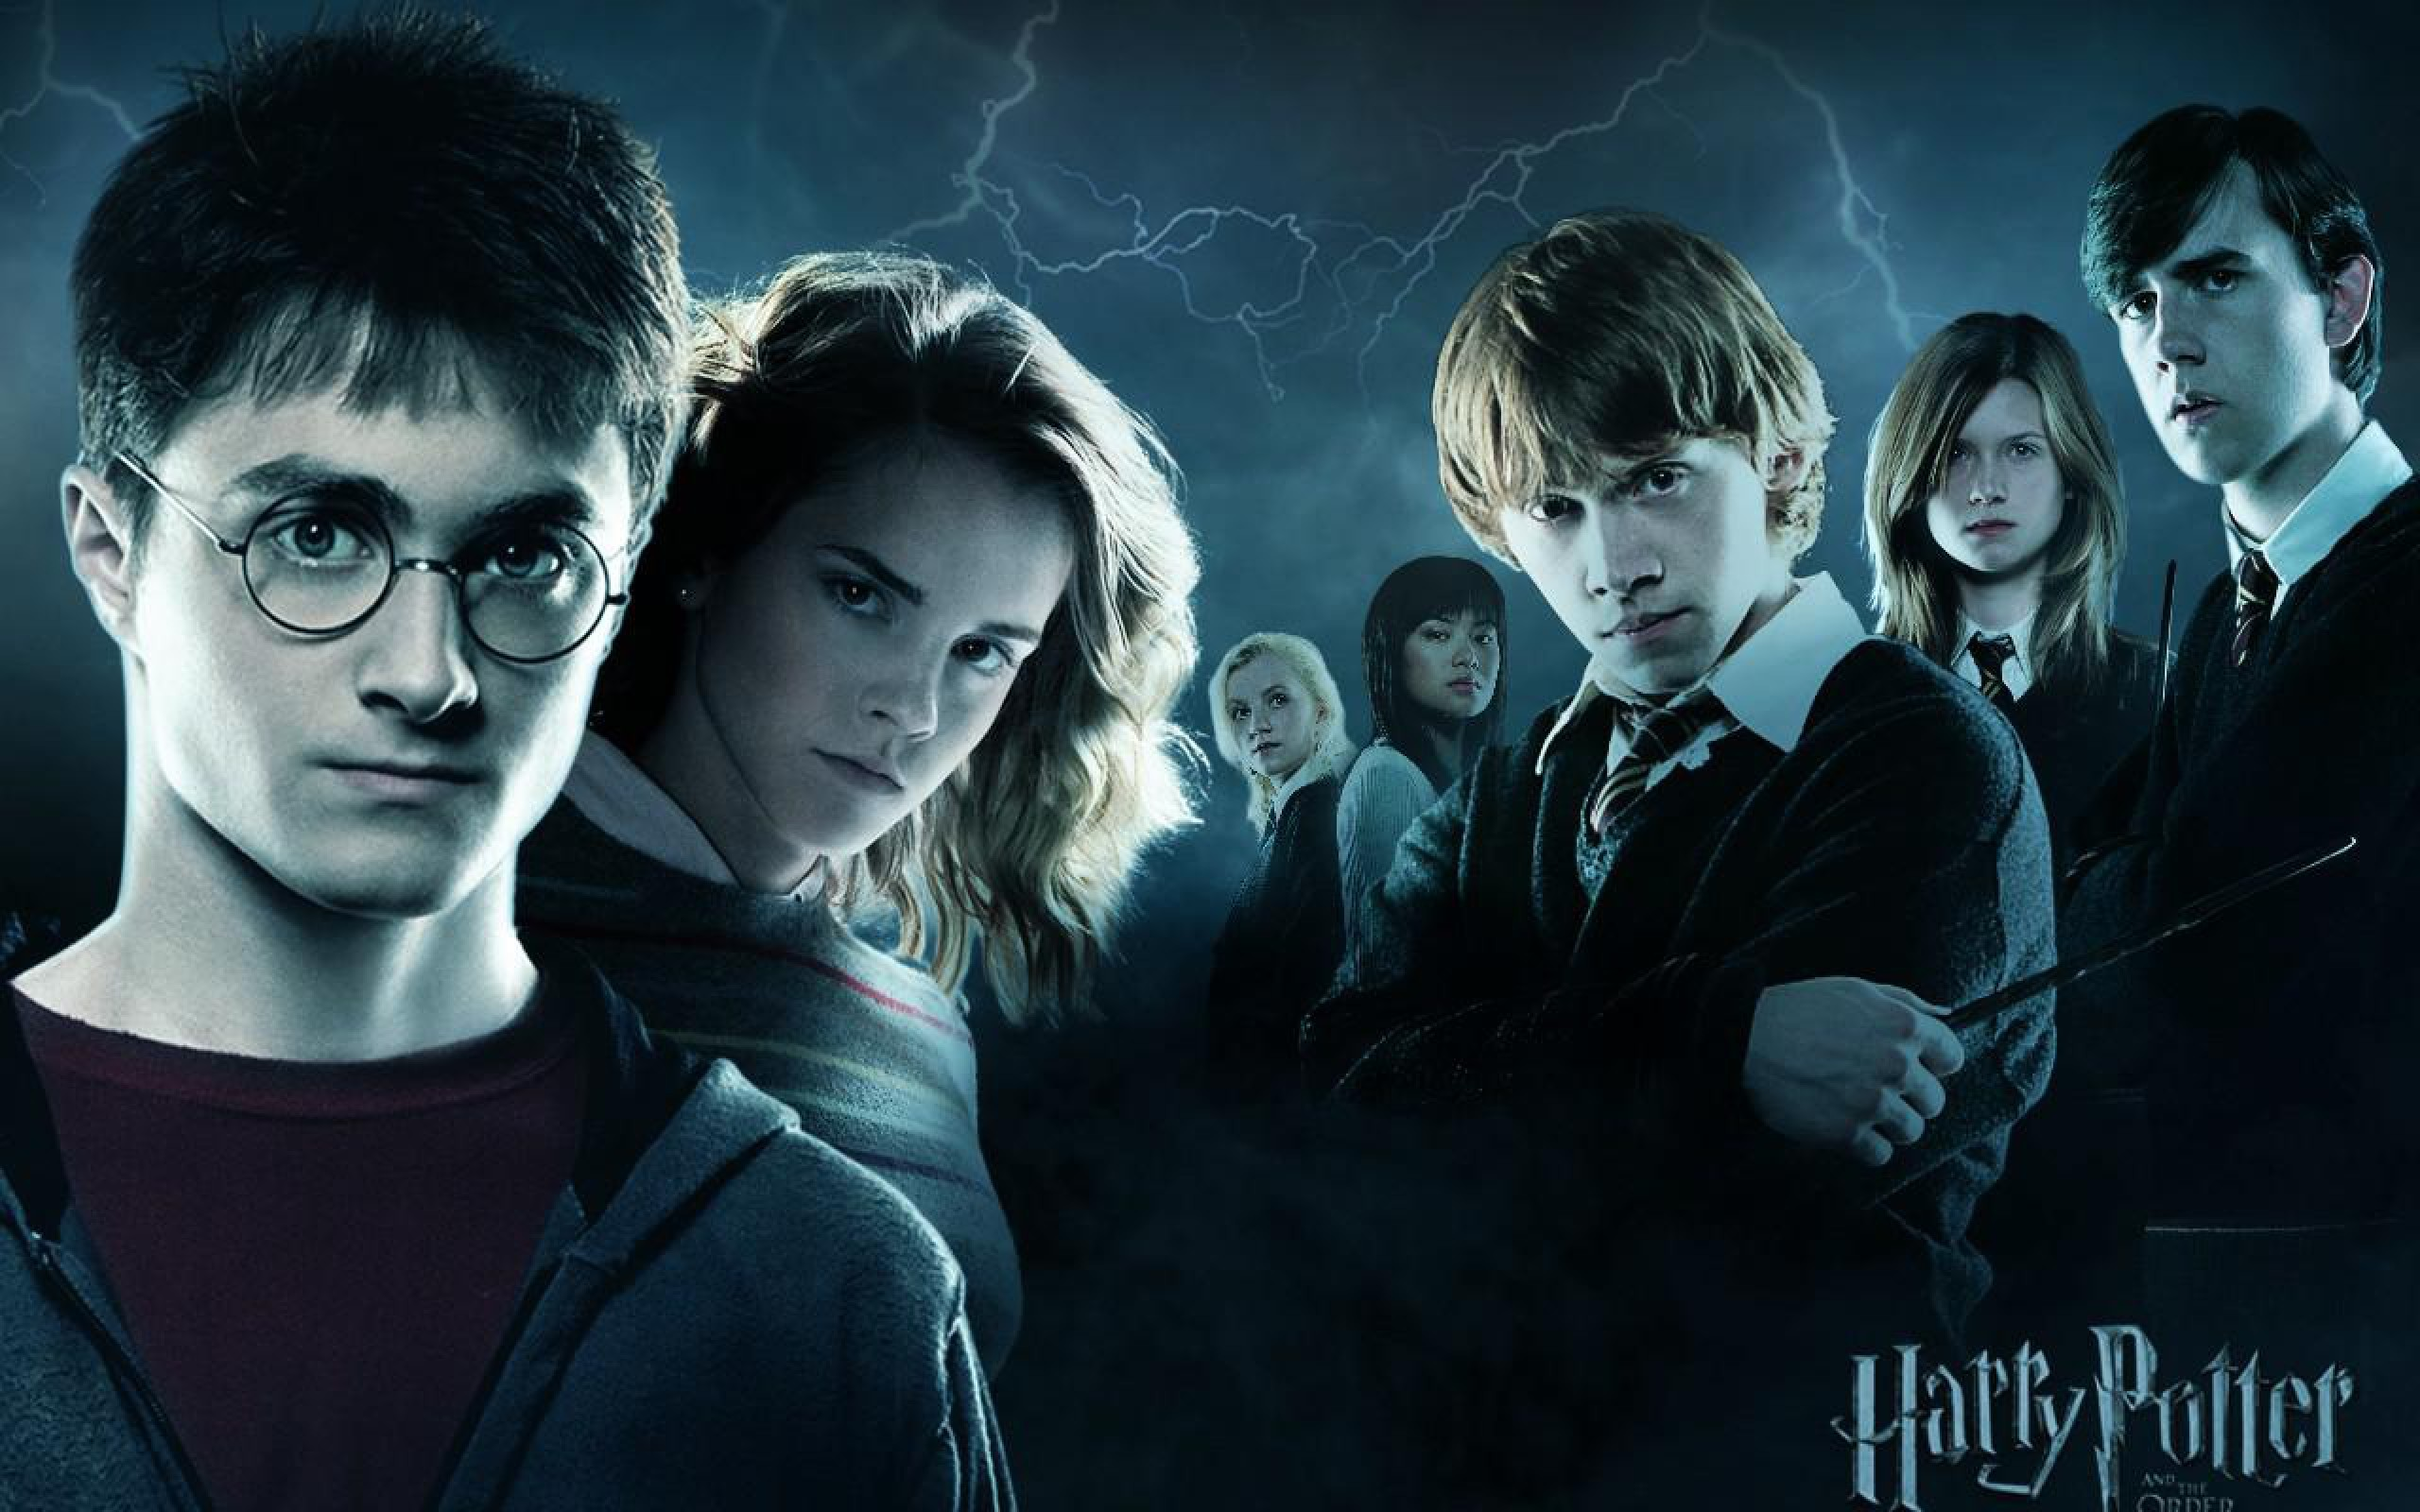 Cool Harry Potter Cast Wallpaper High Definition Wallpapers 1080p Download  Hi Wallpaper Wallpaper HD For Desktop